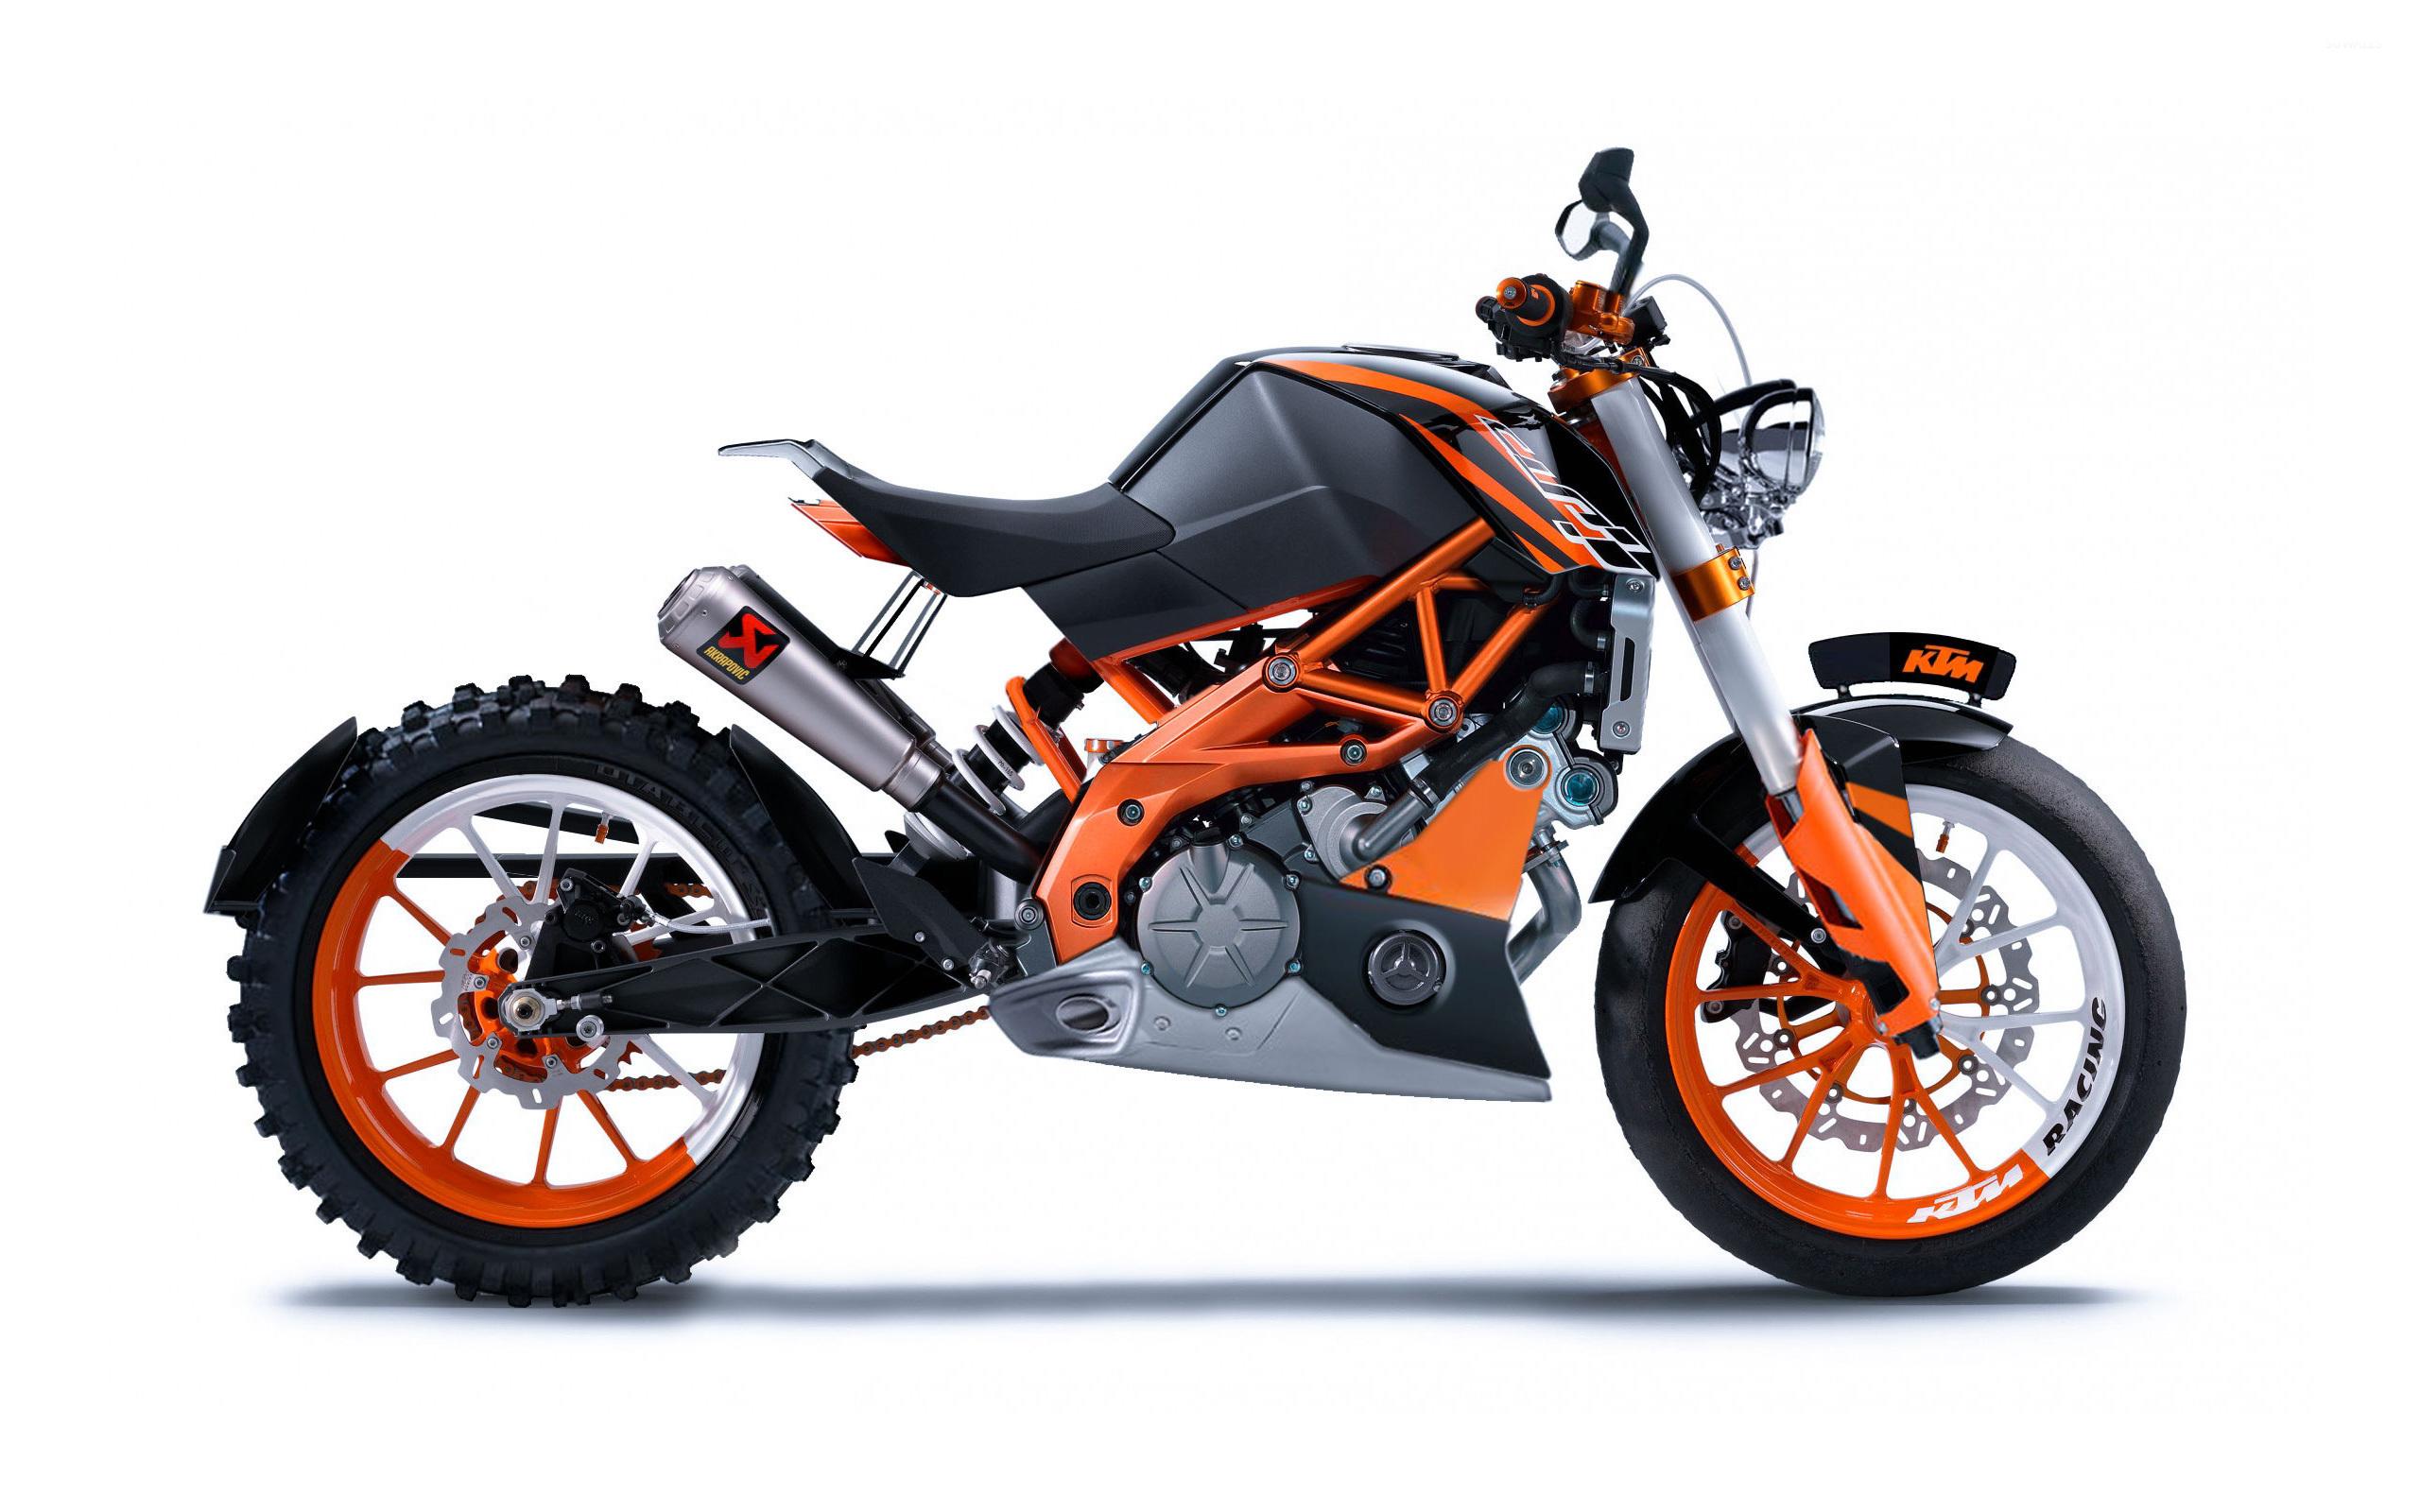 KTM Duke 125 wallpaper   Motorcycle wallpapers   5176 2560x1600